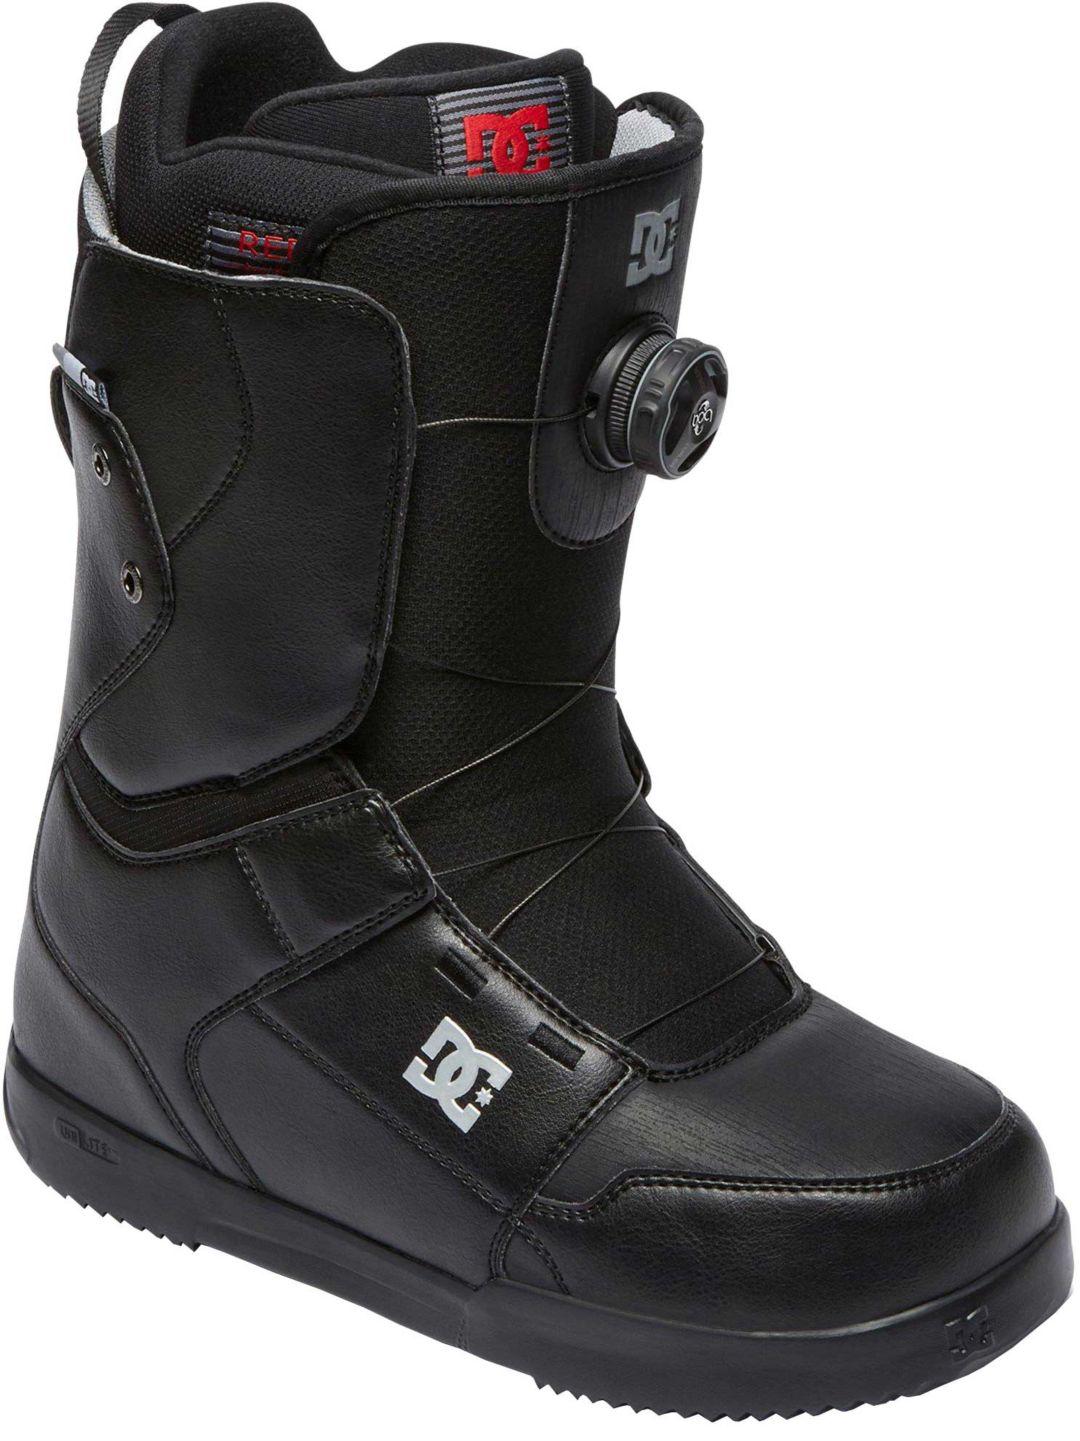 durable service lowest discount cheap for discount DC Shoes Men's Scout BOA 2018-2019 Snowboard Boots